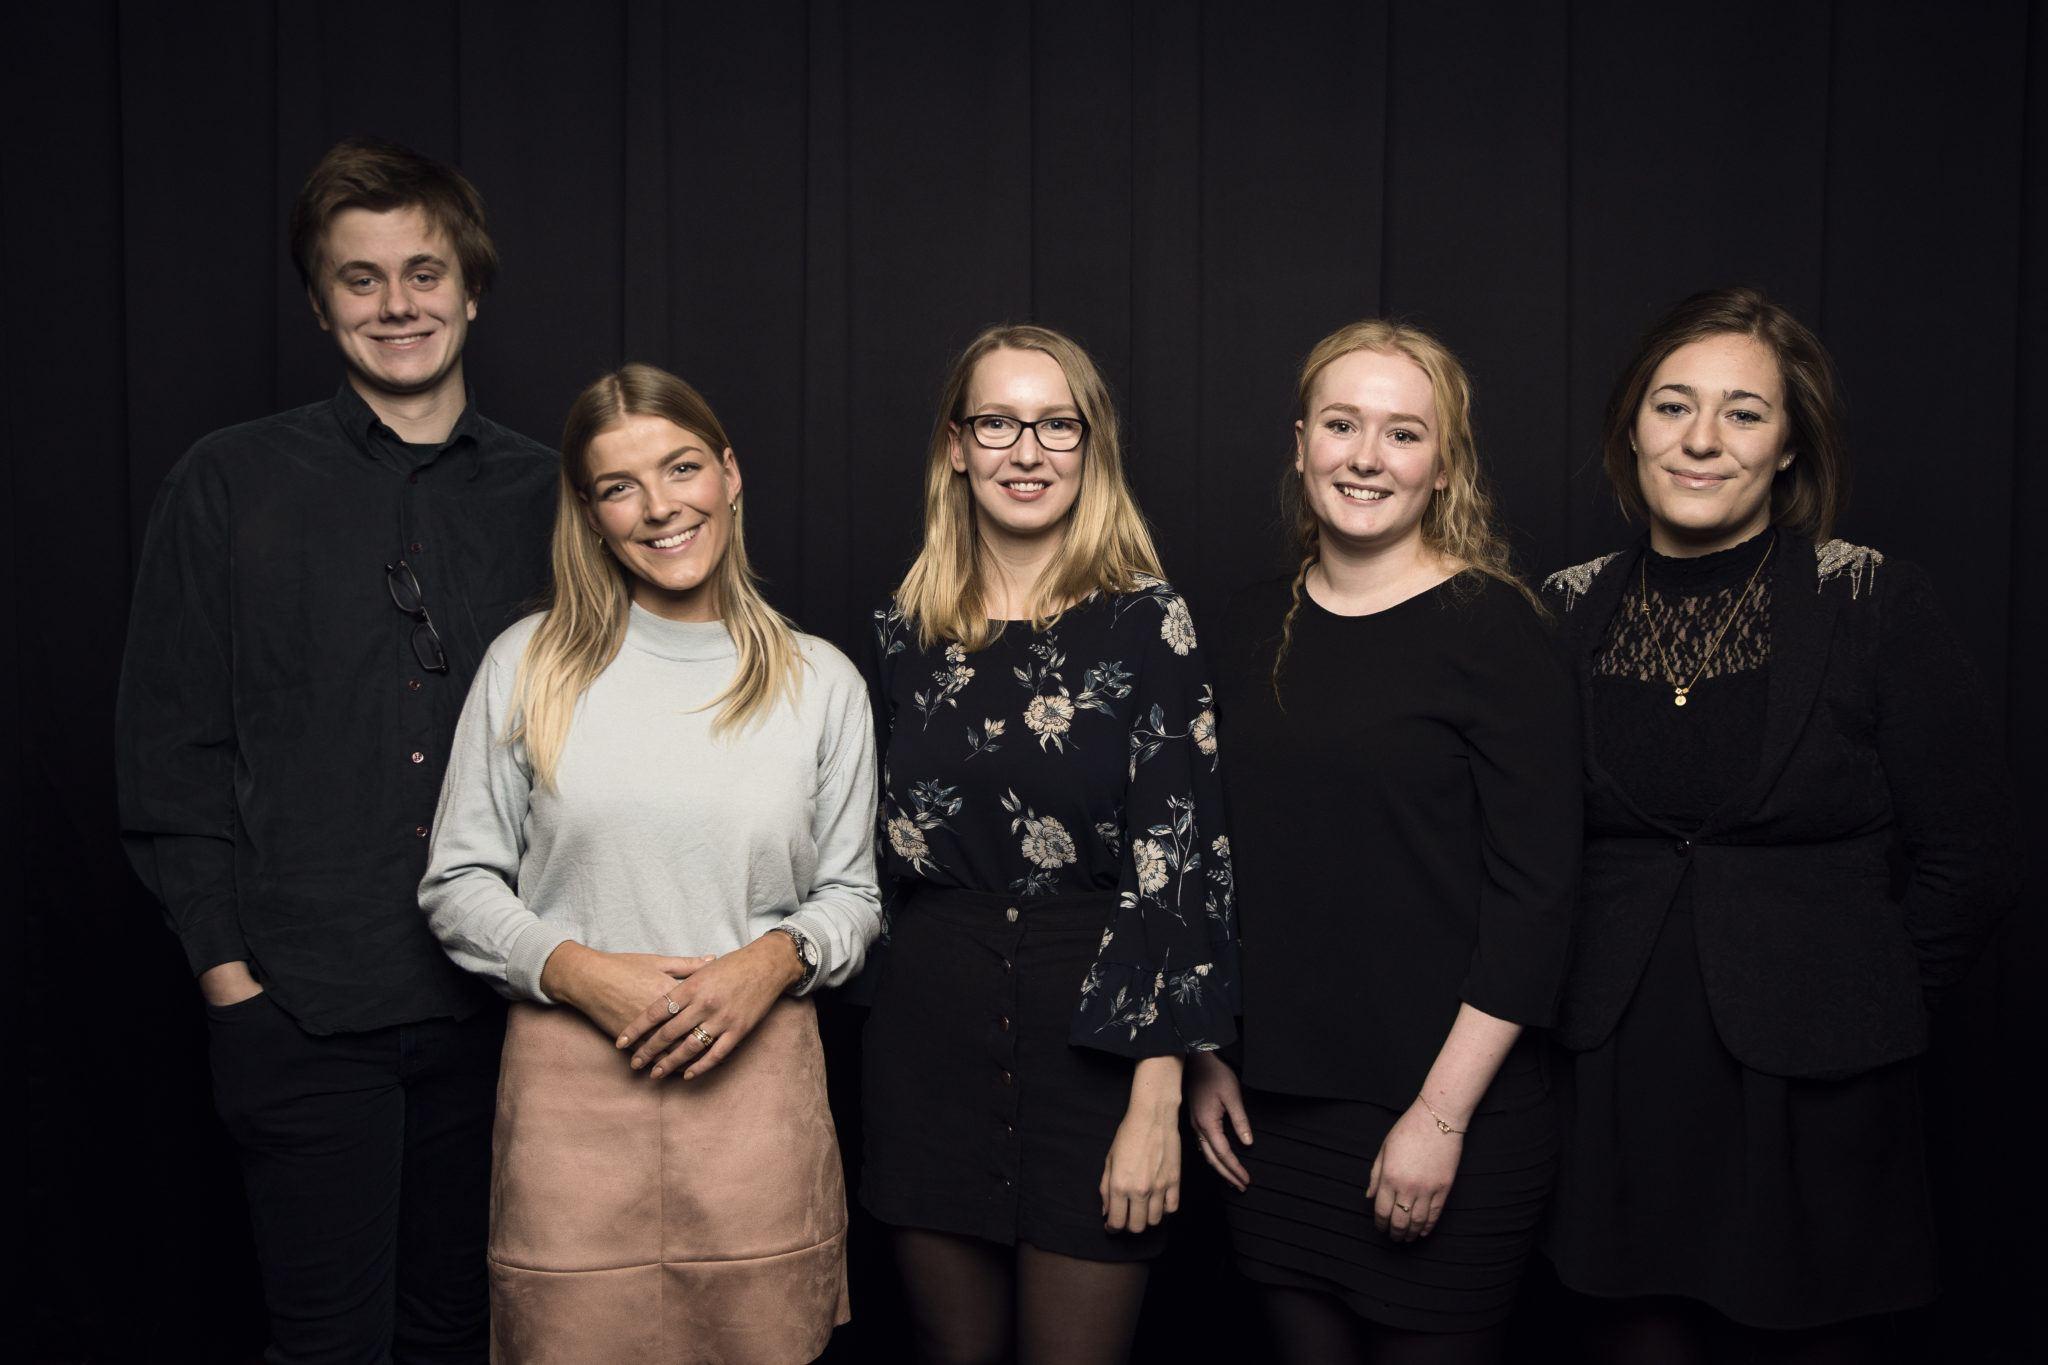 Fem elever fra Grenaa Gymnasium modtog diplom Akademiet for Talentfulde Unge 2018